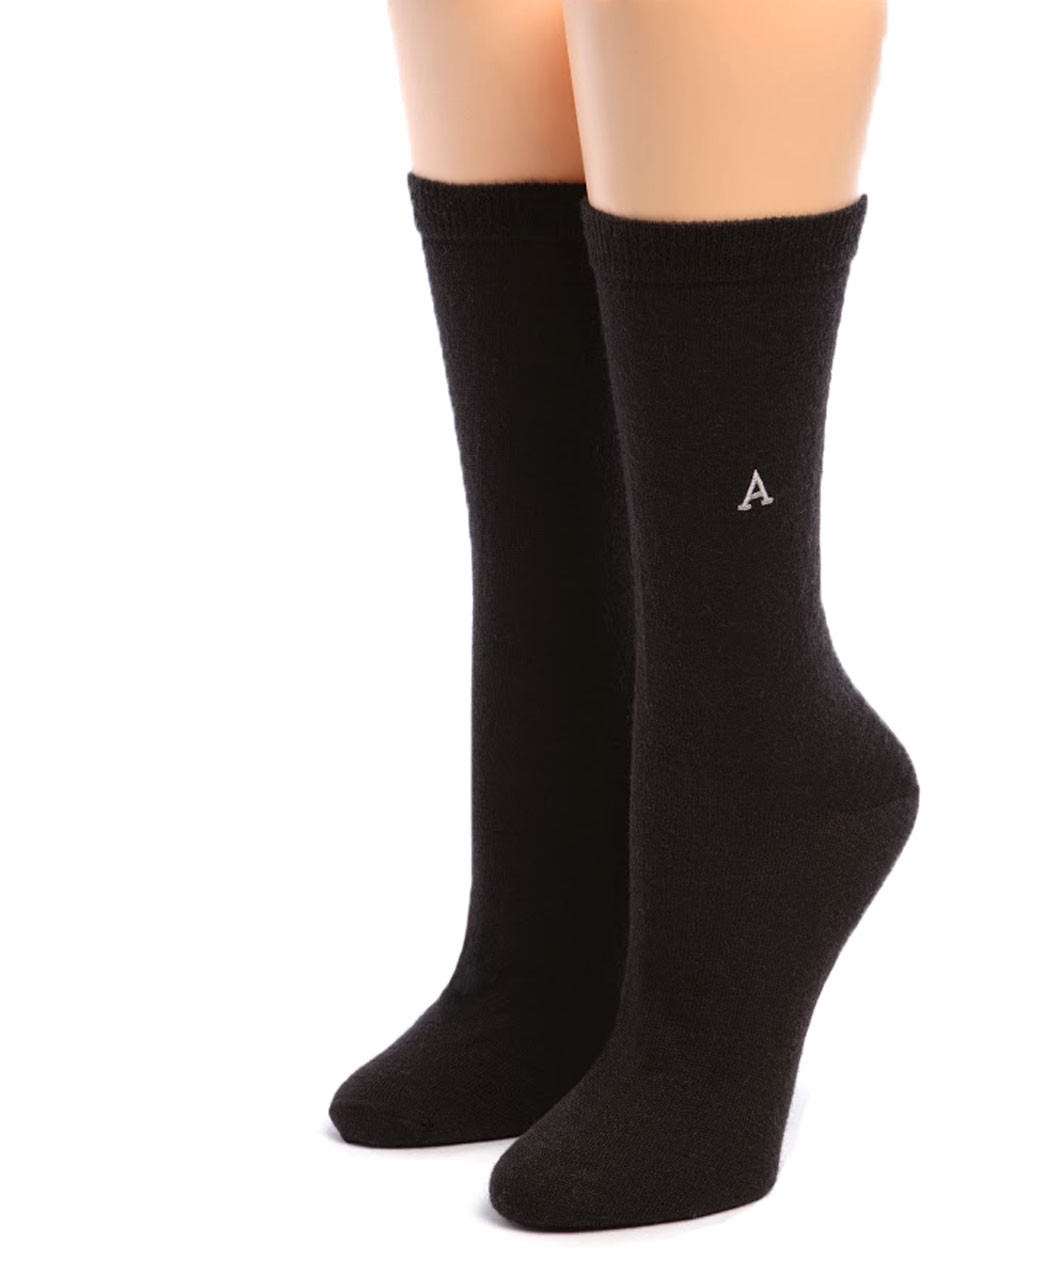 Alpaca Socks - Ladies Lightweight Trouser Socks   Sun Valley Alpaca Socks